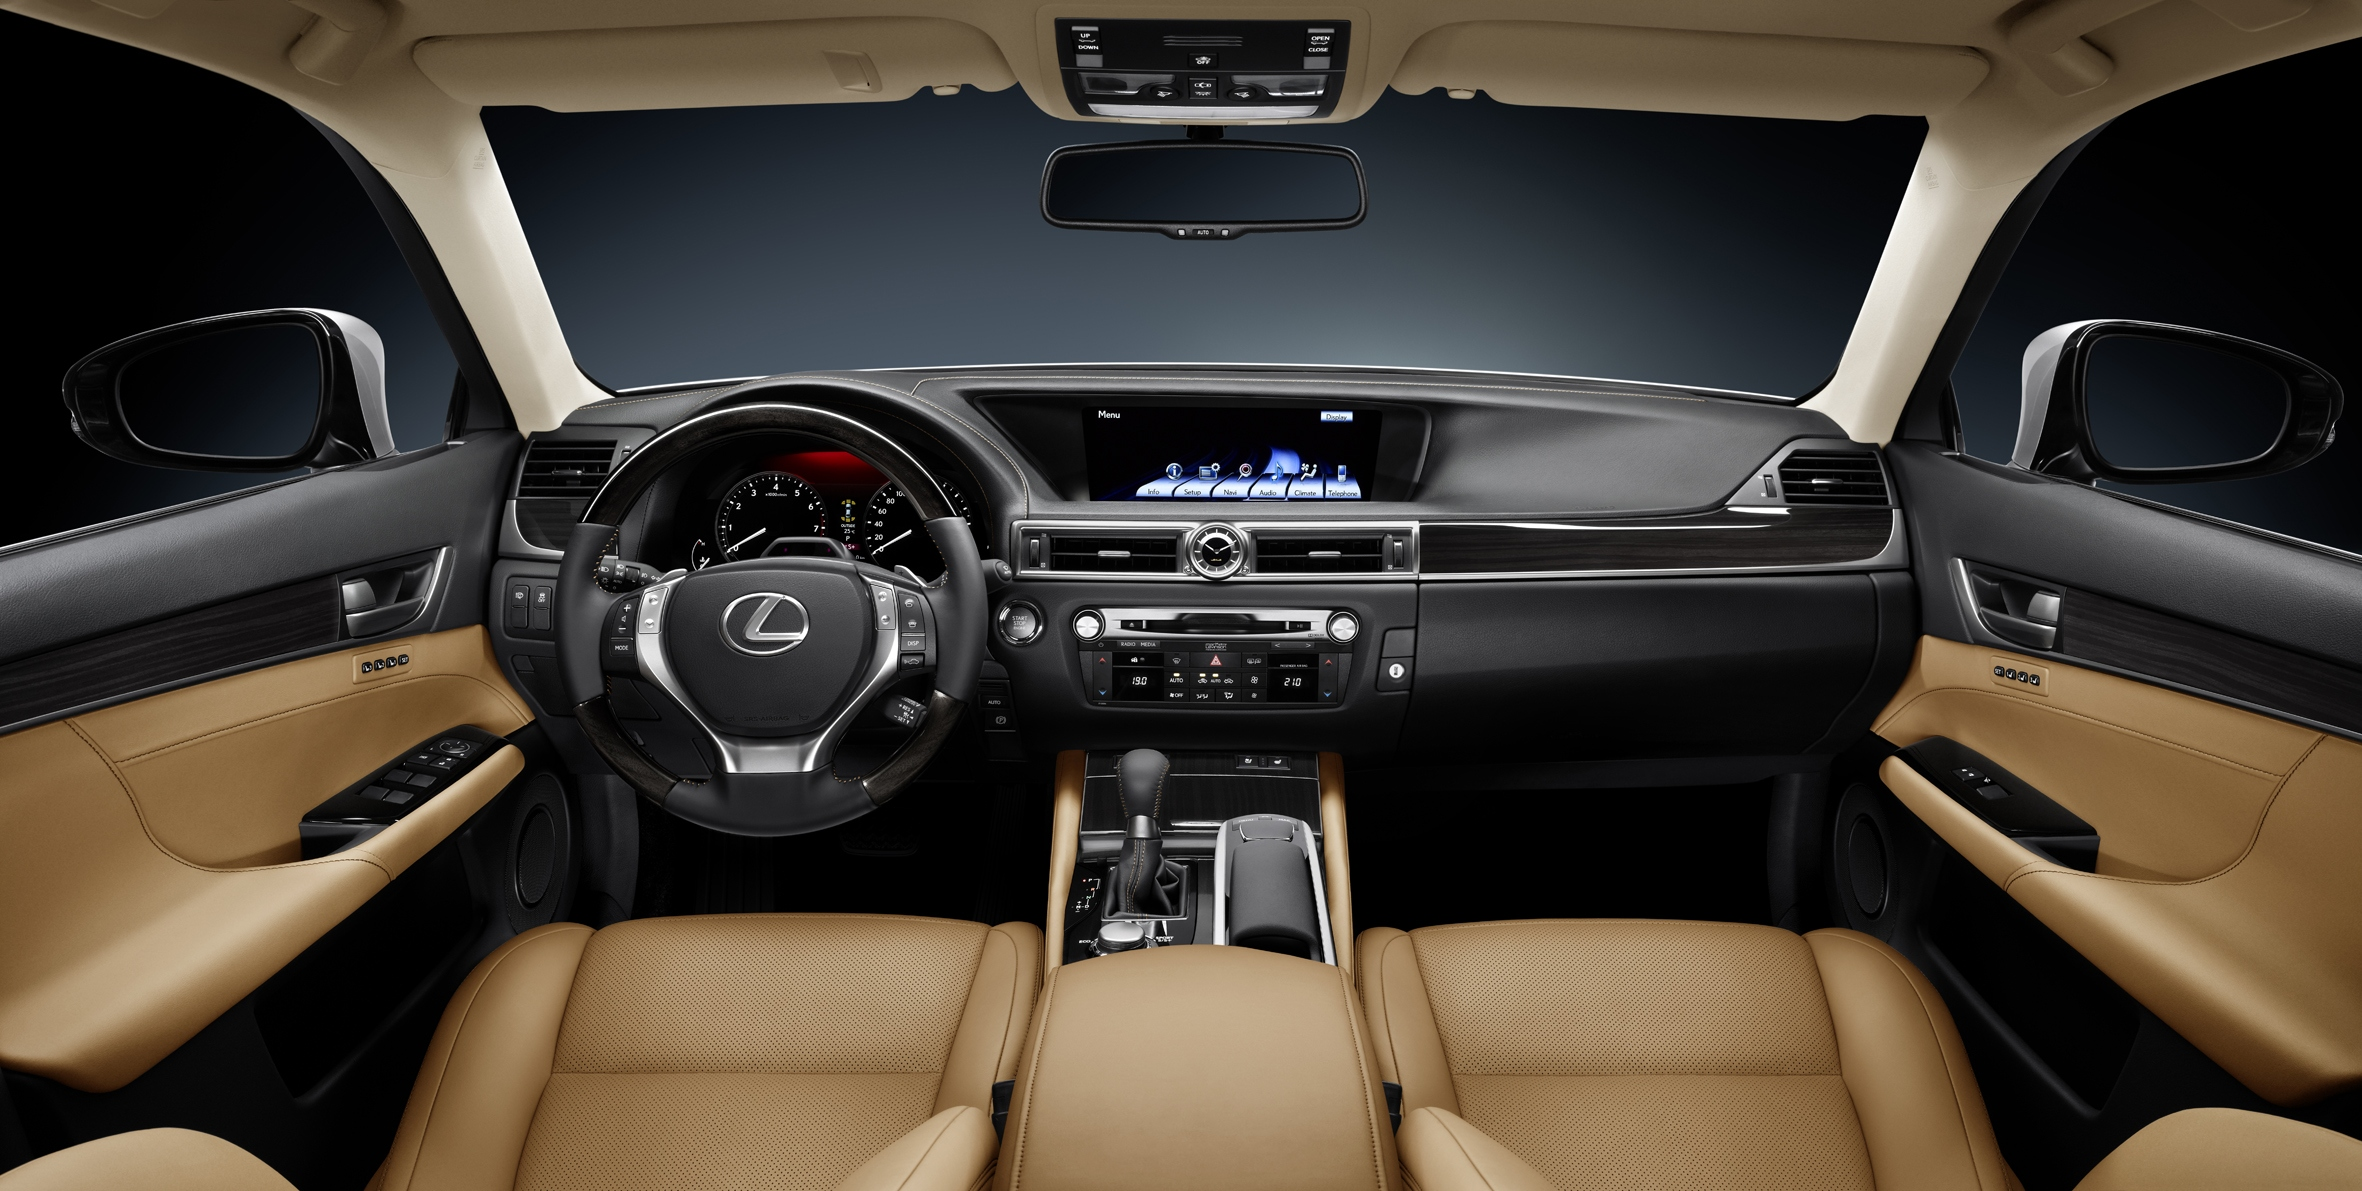 http://www.carwriteups.co.uk/wp-content/uploads/2012/12/2012-Lexus-GS-450h-cabin.jpg